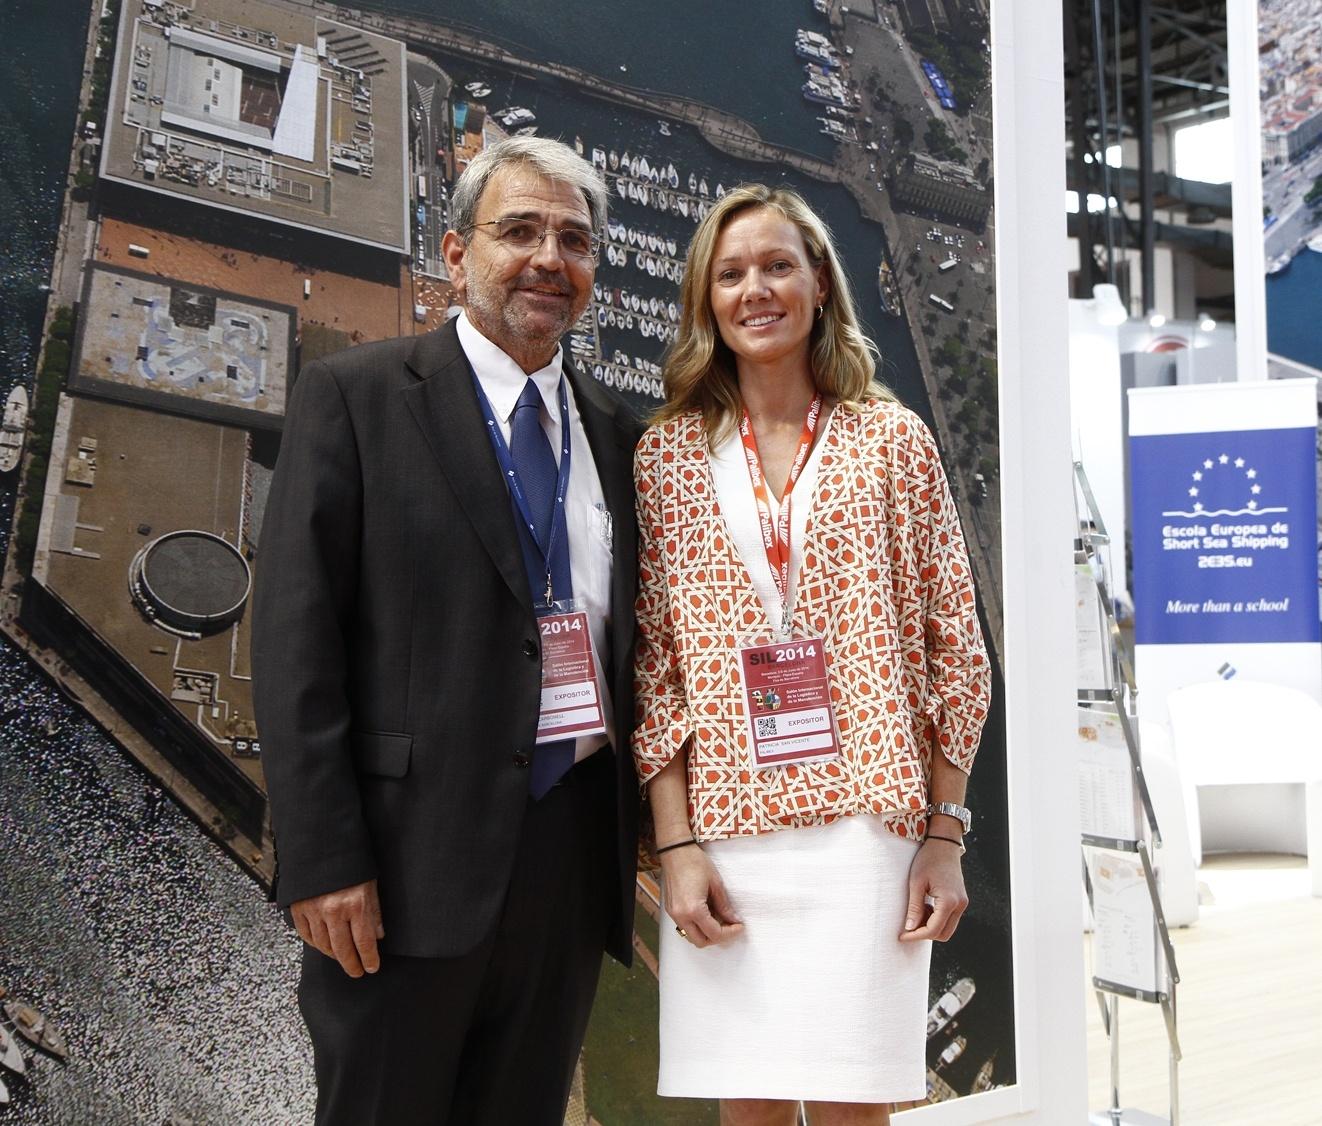 Ana Lobato, Directora Lega y RRHH